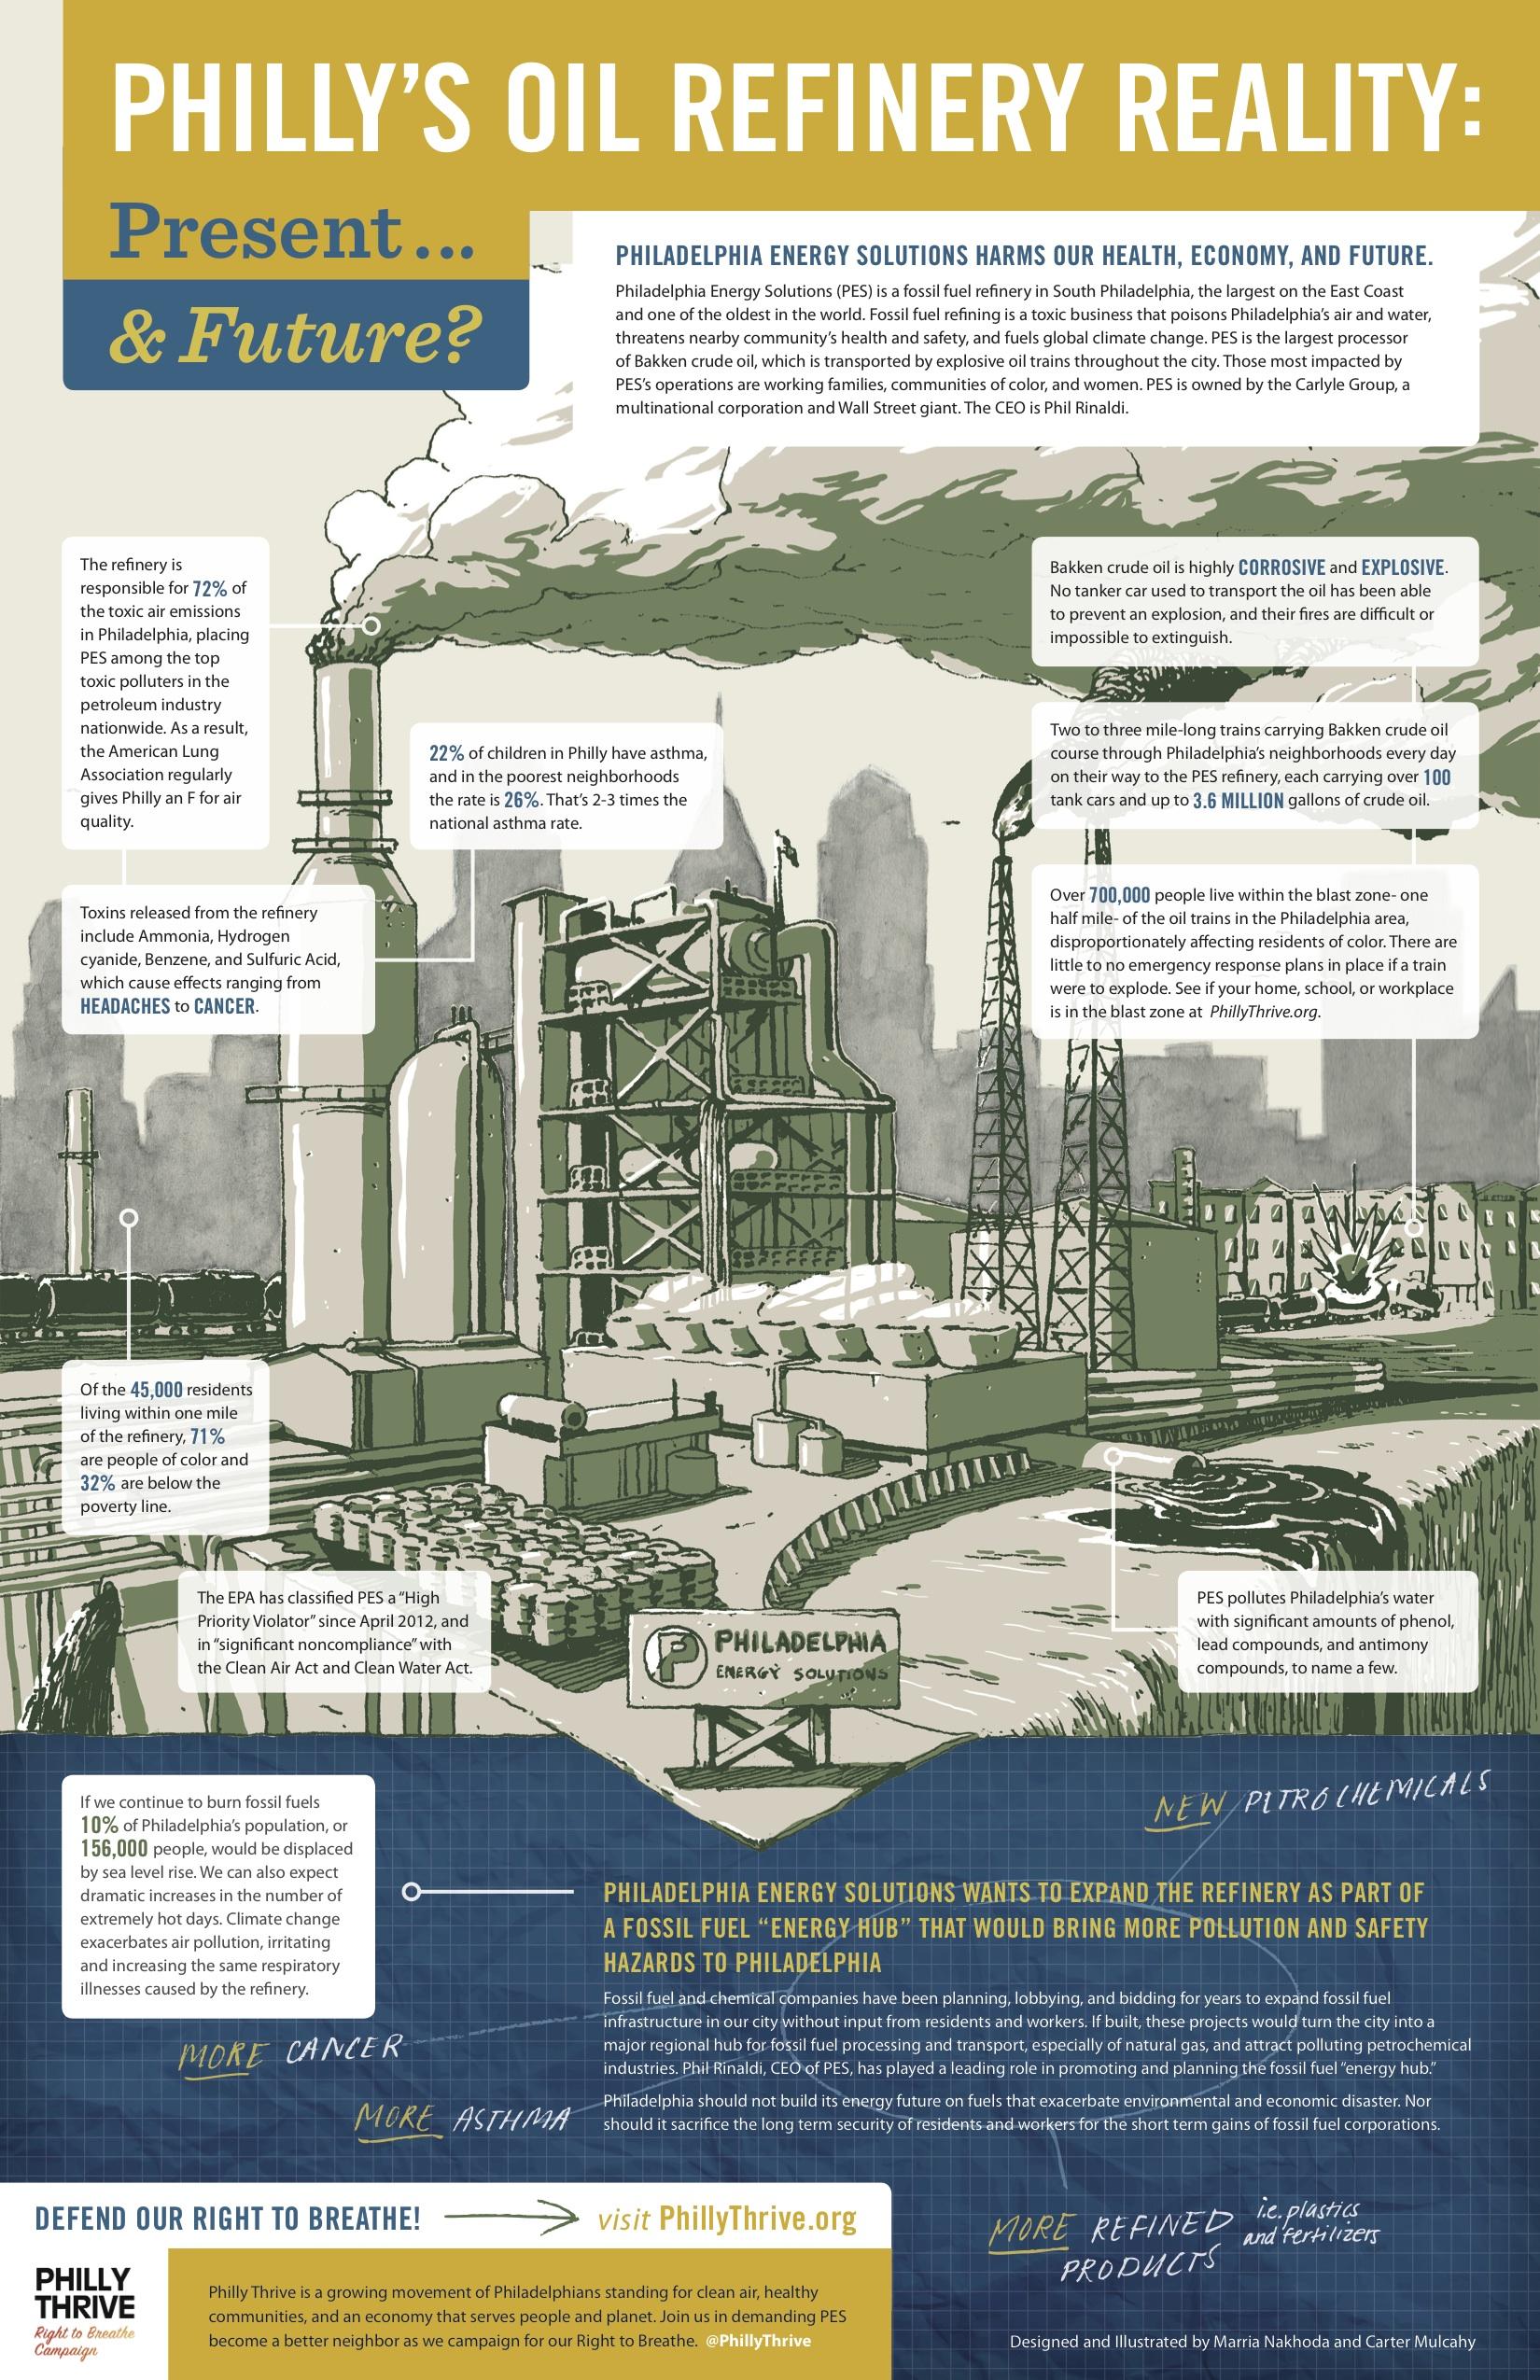 RefineryReality_Infographic.jpg